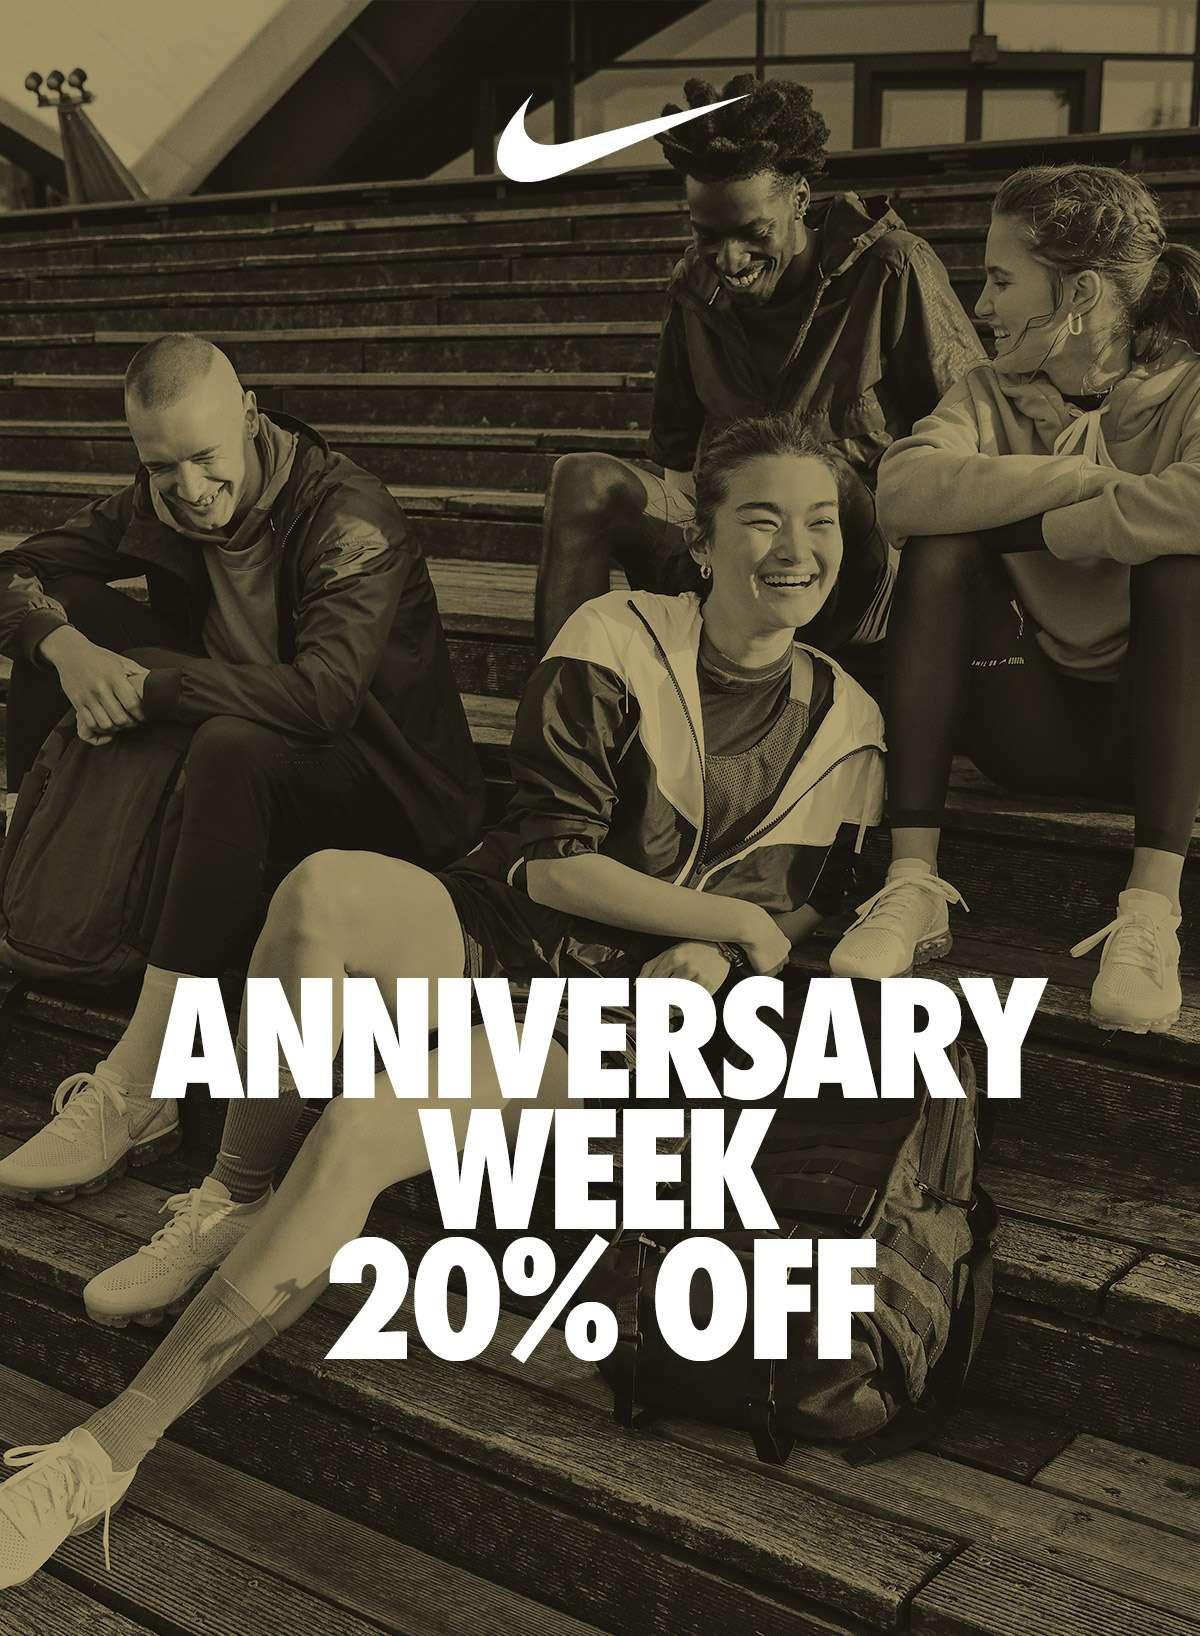 NIKE | ANNIVERSARY WEEK 20% OFF